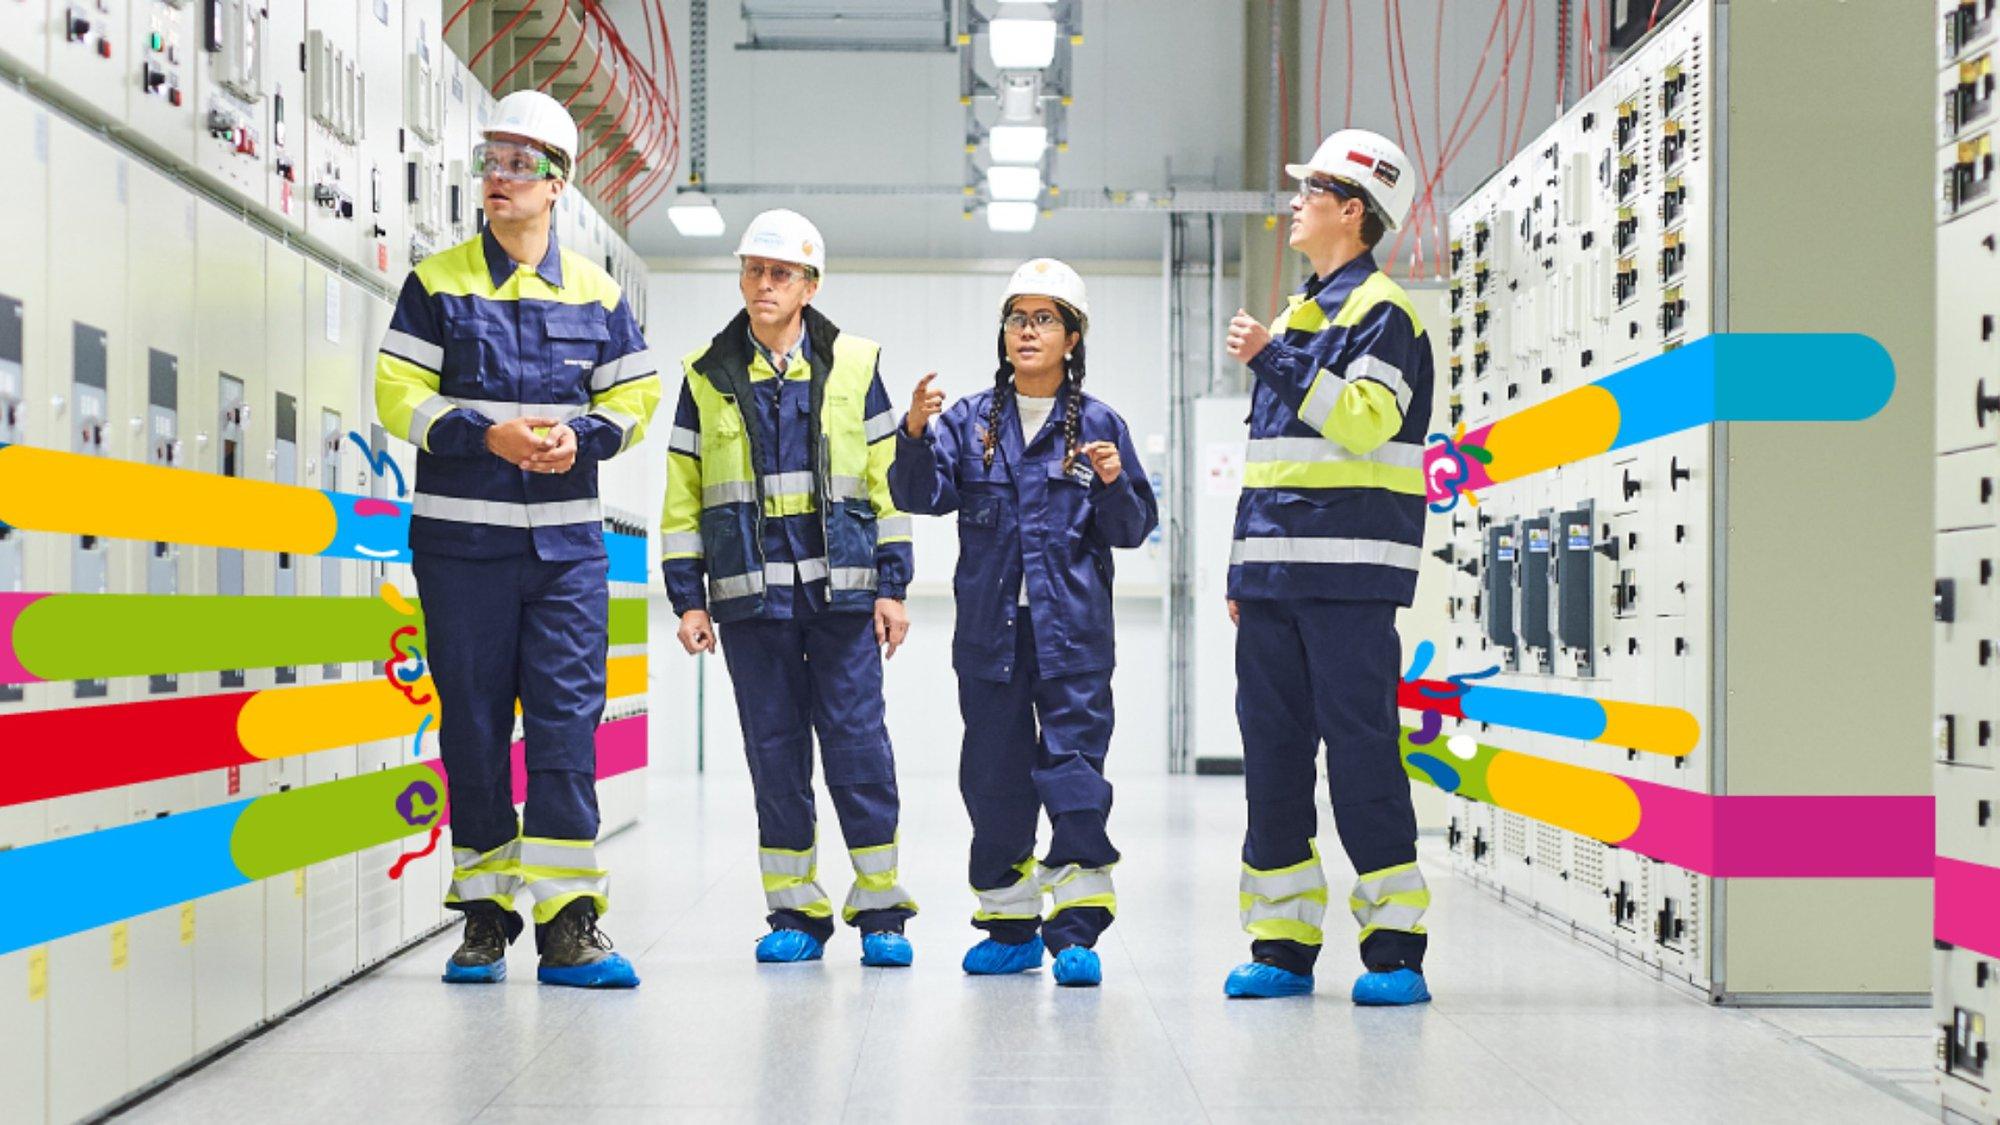 Future ready teams bij ENGIE door digitale opleidingssprong